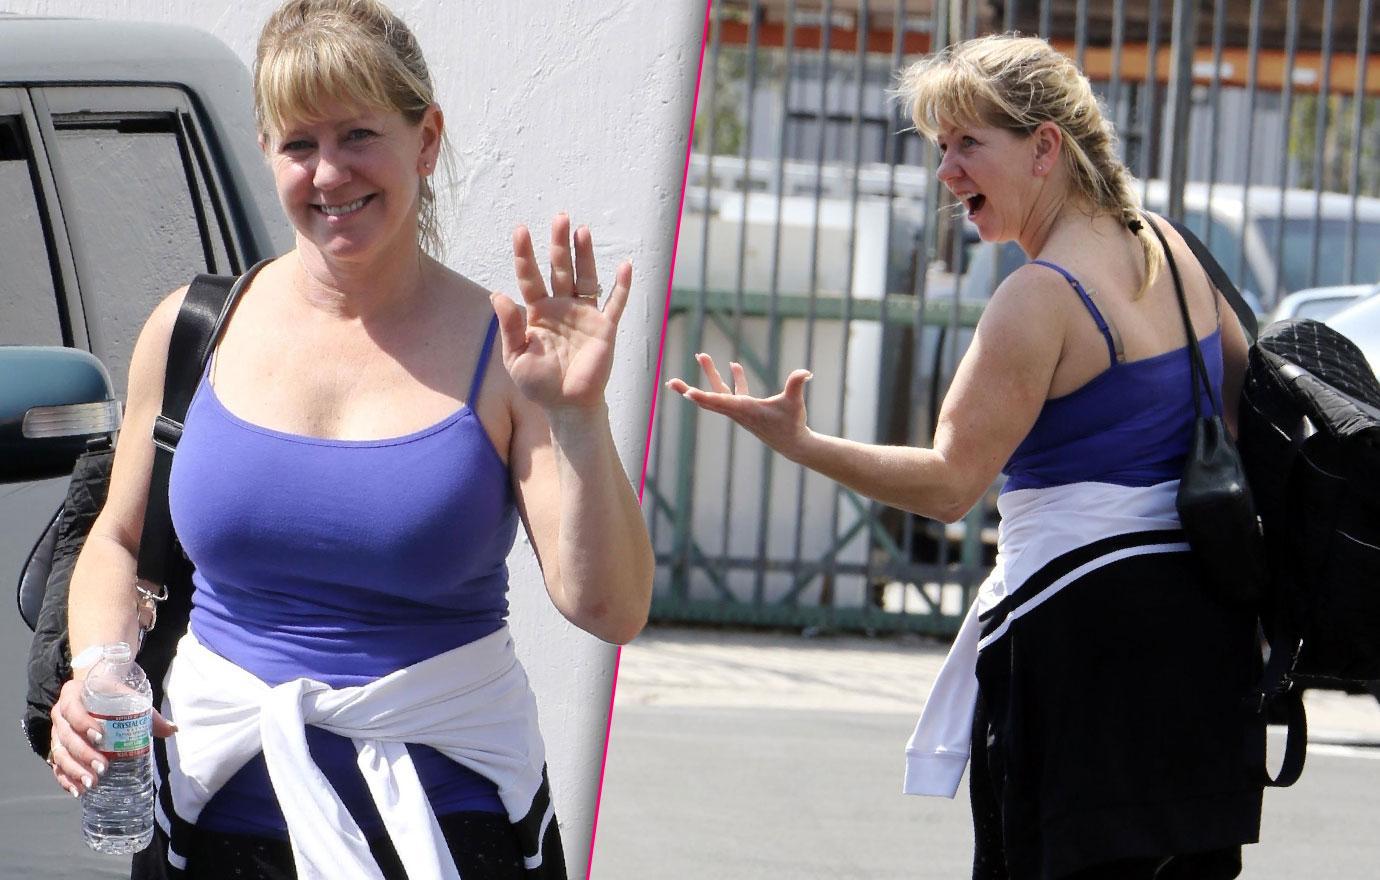 Tonya Harding Rehearses For DWTS Premiere Amid Diva Rumors